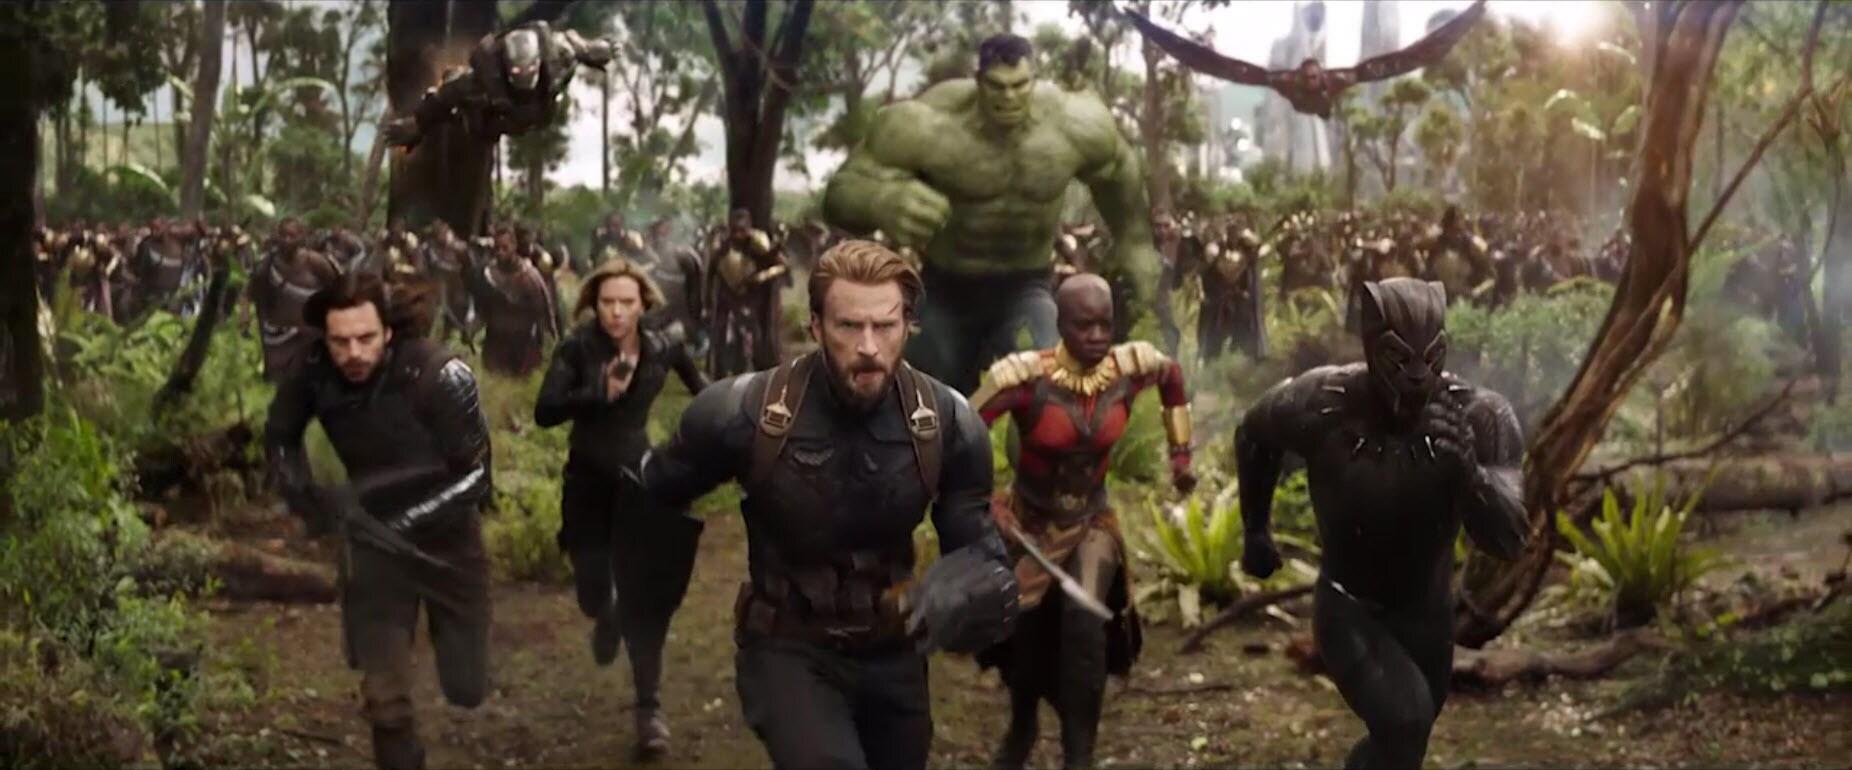 Avengers Infinity War Teaser Trailer